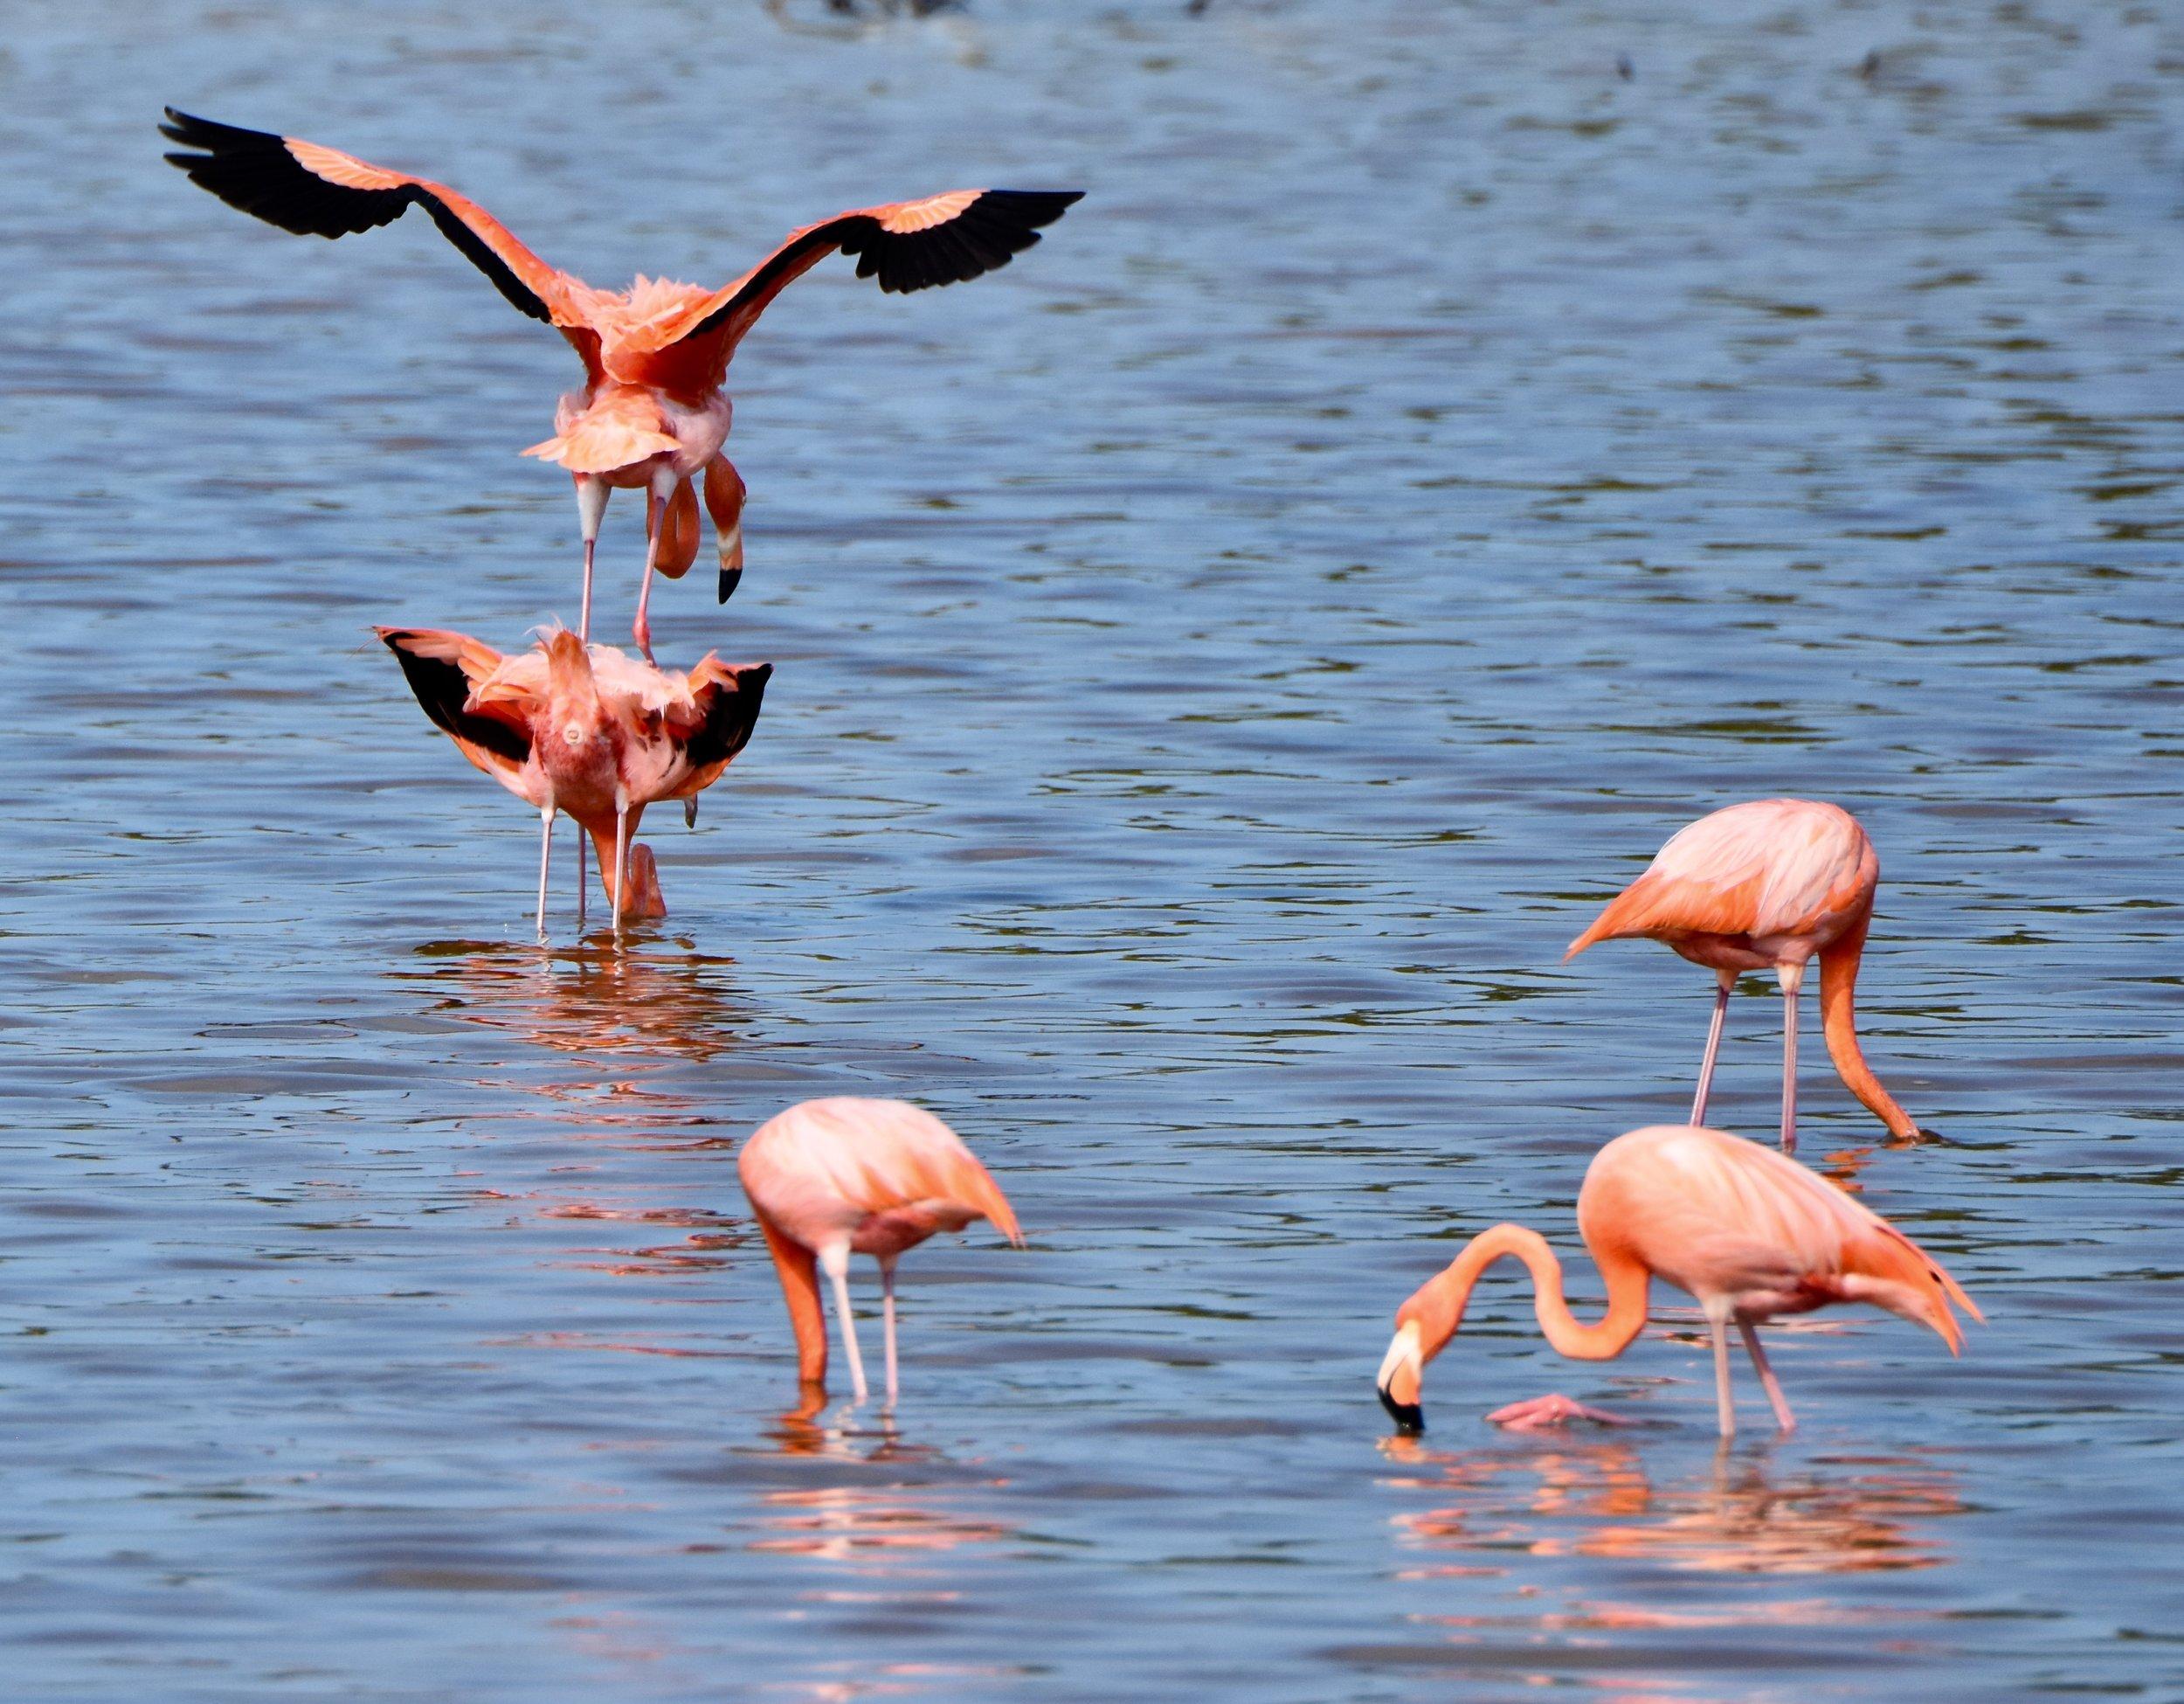 Look at that shiny flamingo cloaca!